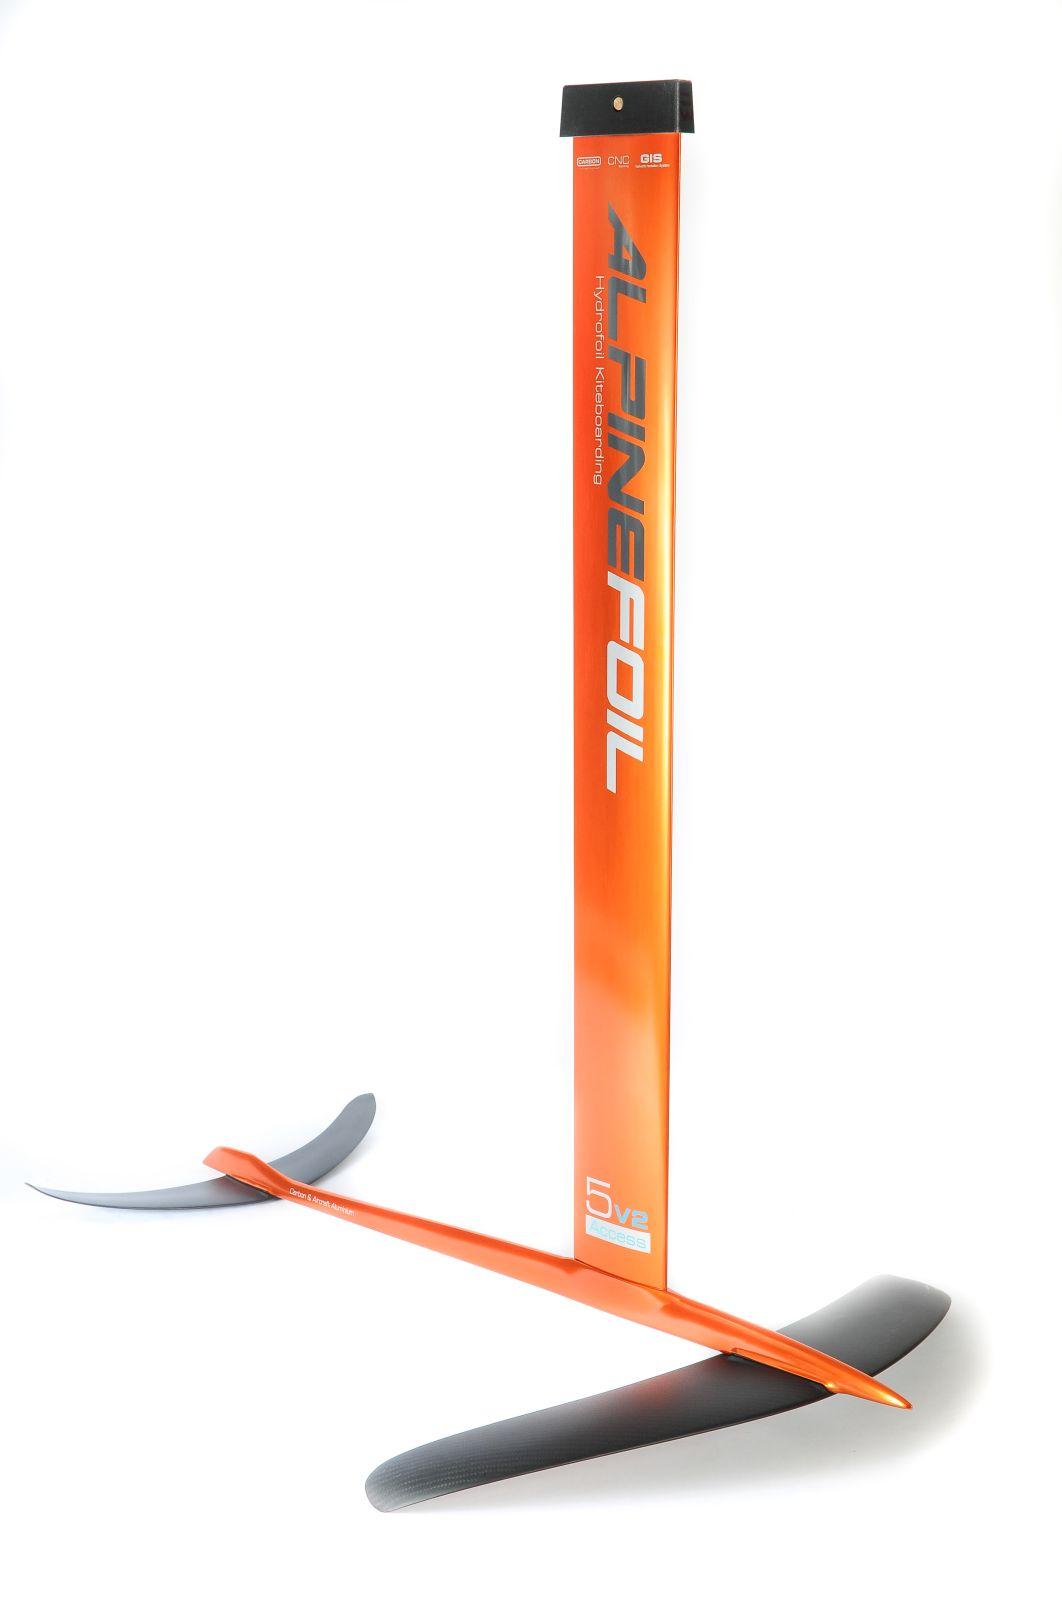 Kitefoil AlpineFoil 5.0 Access V2 - KF box